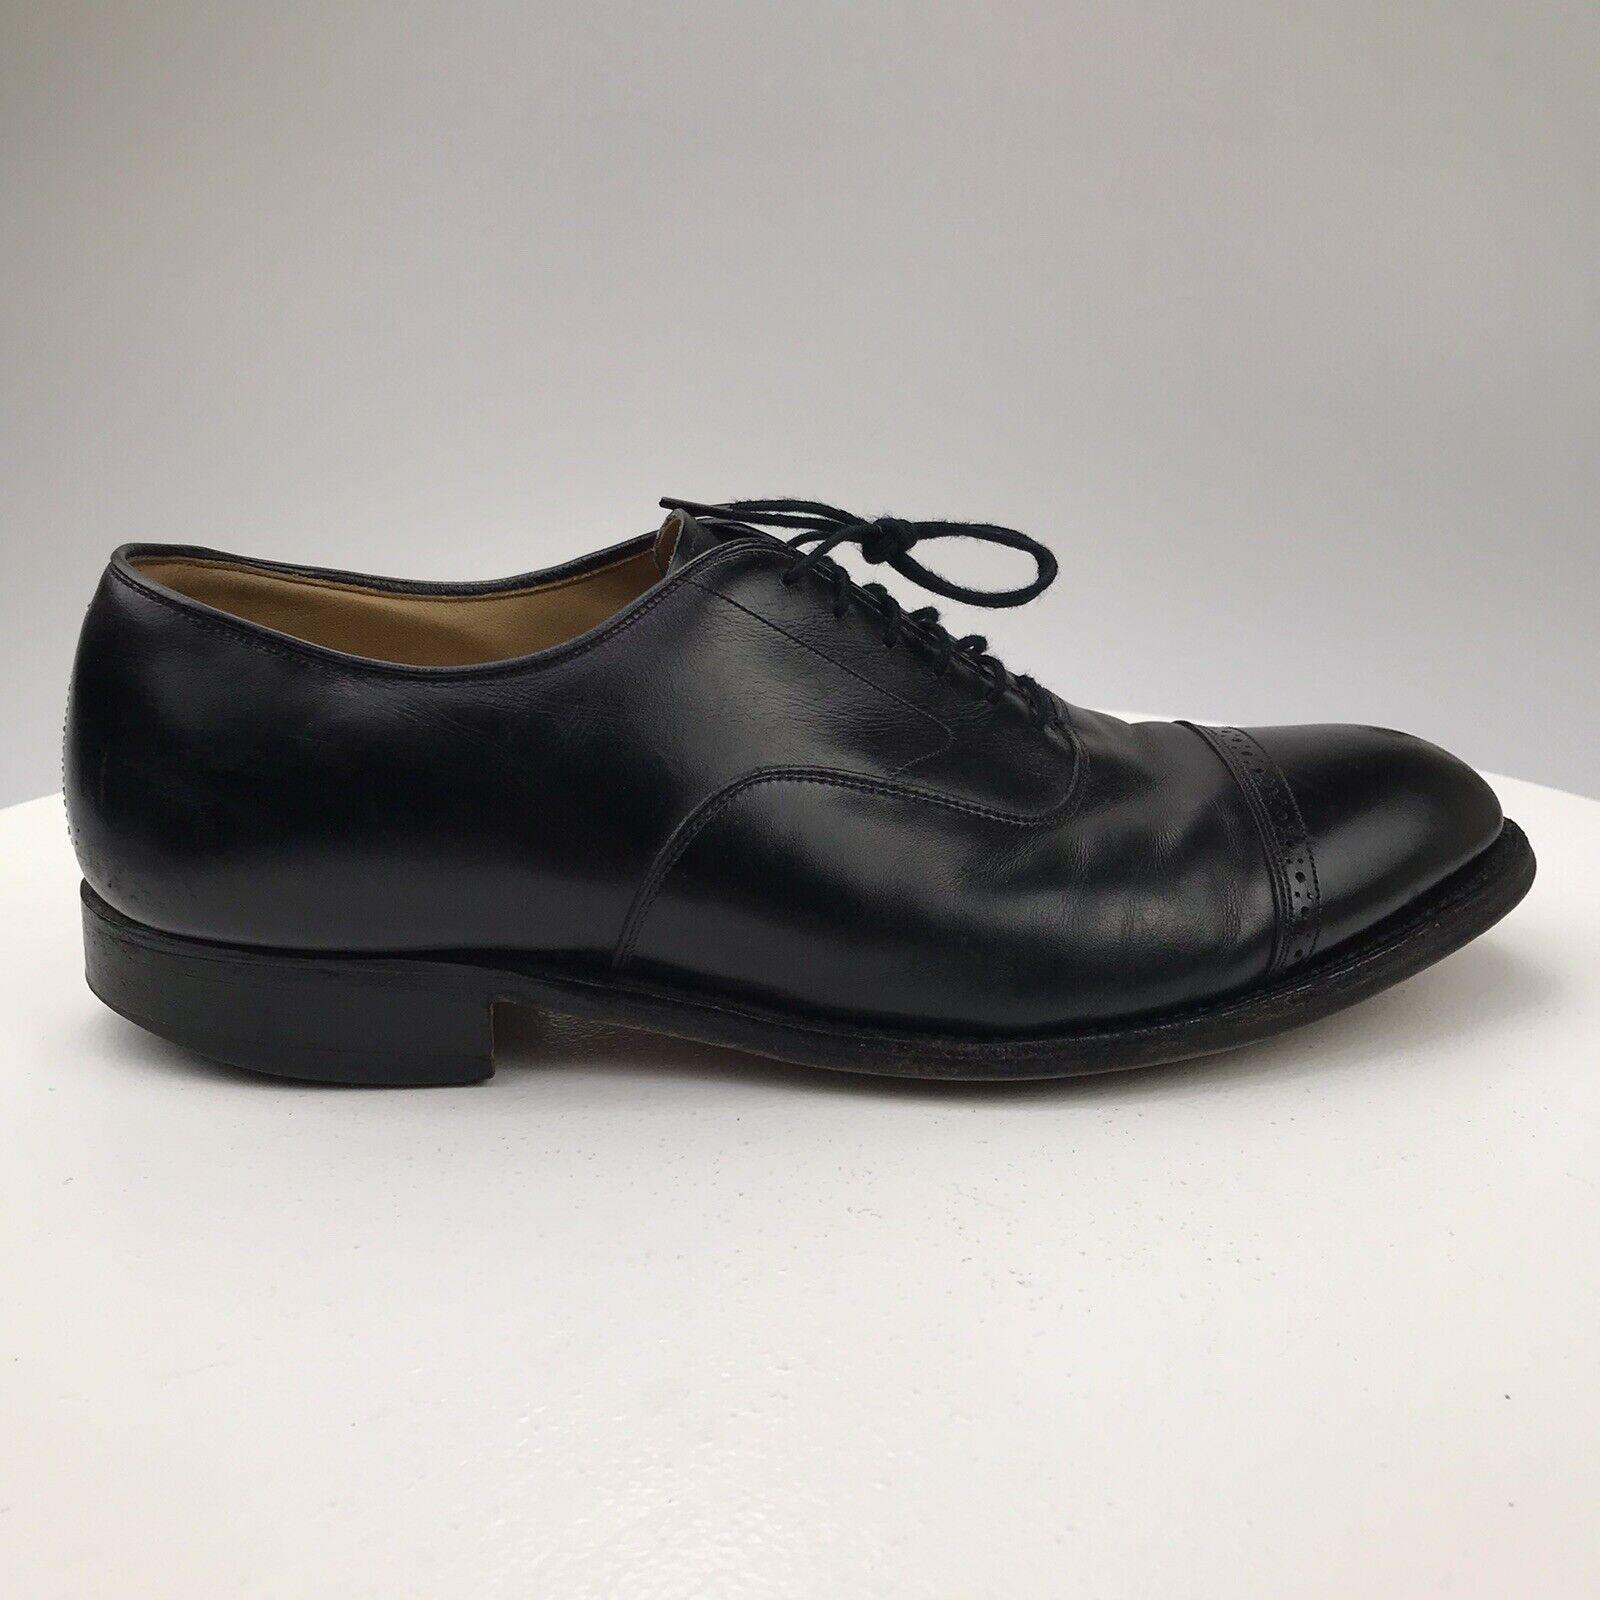 Mens 10 D Vintage USA Made Johnston Murphy Aldrich Black Leather Cap Toe Oxfords